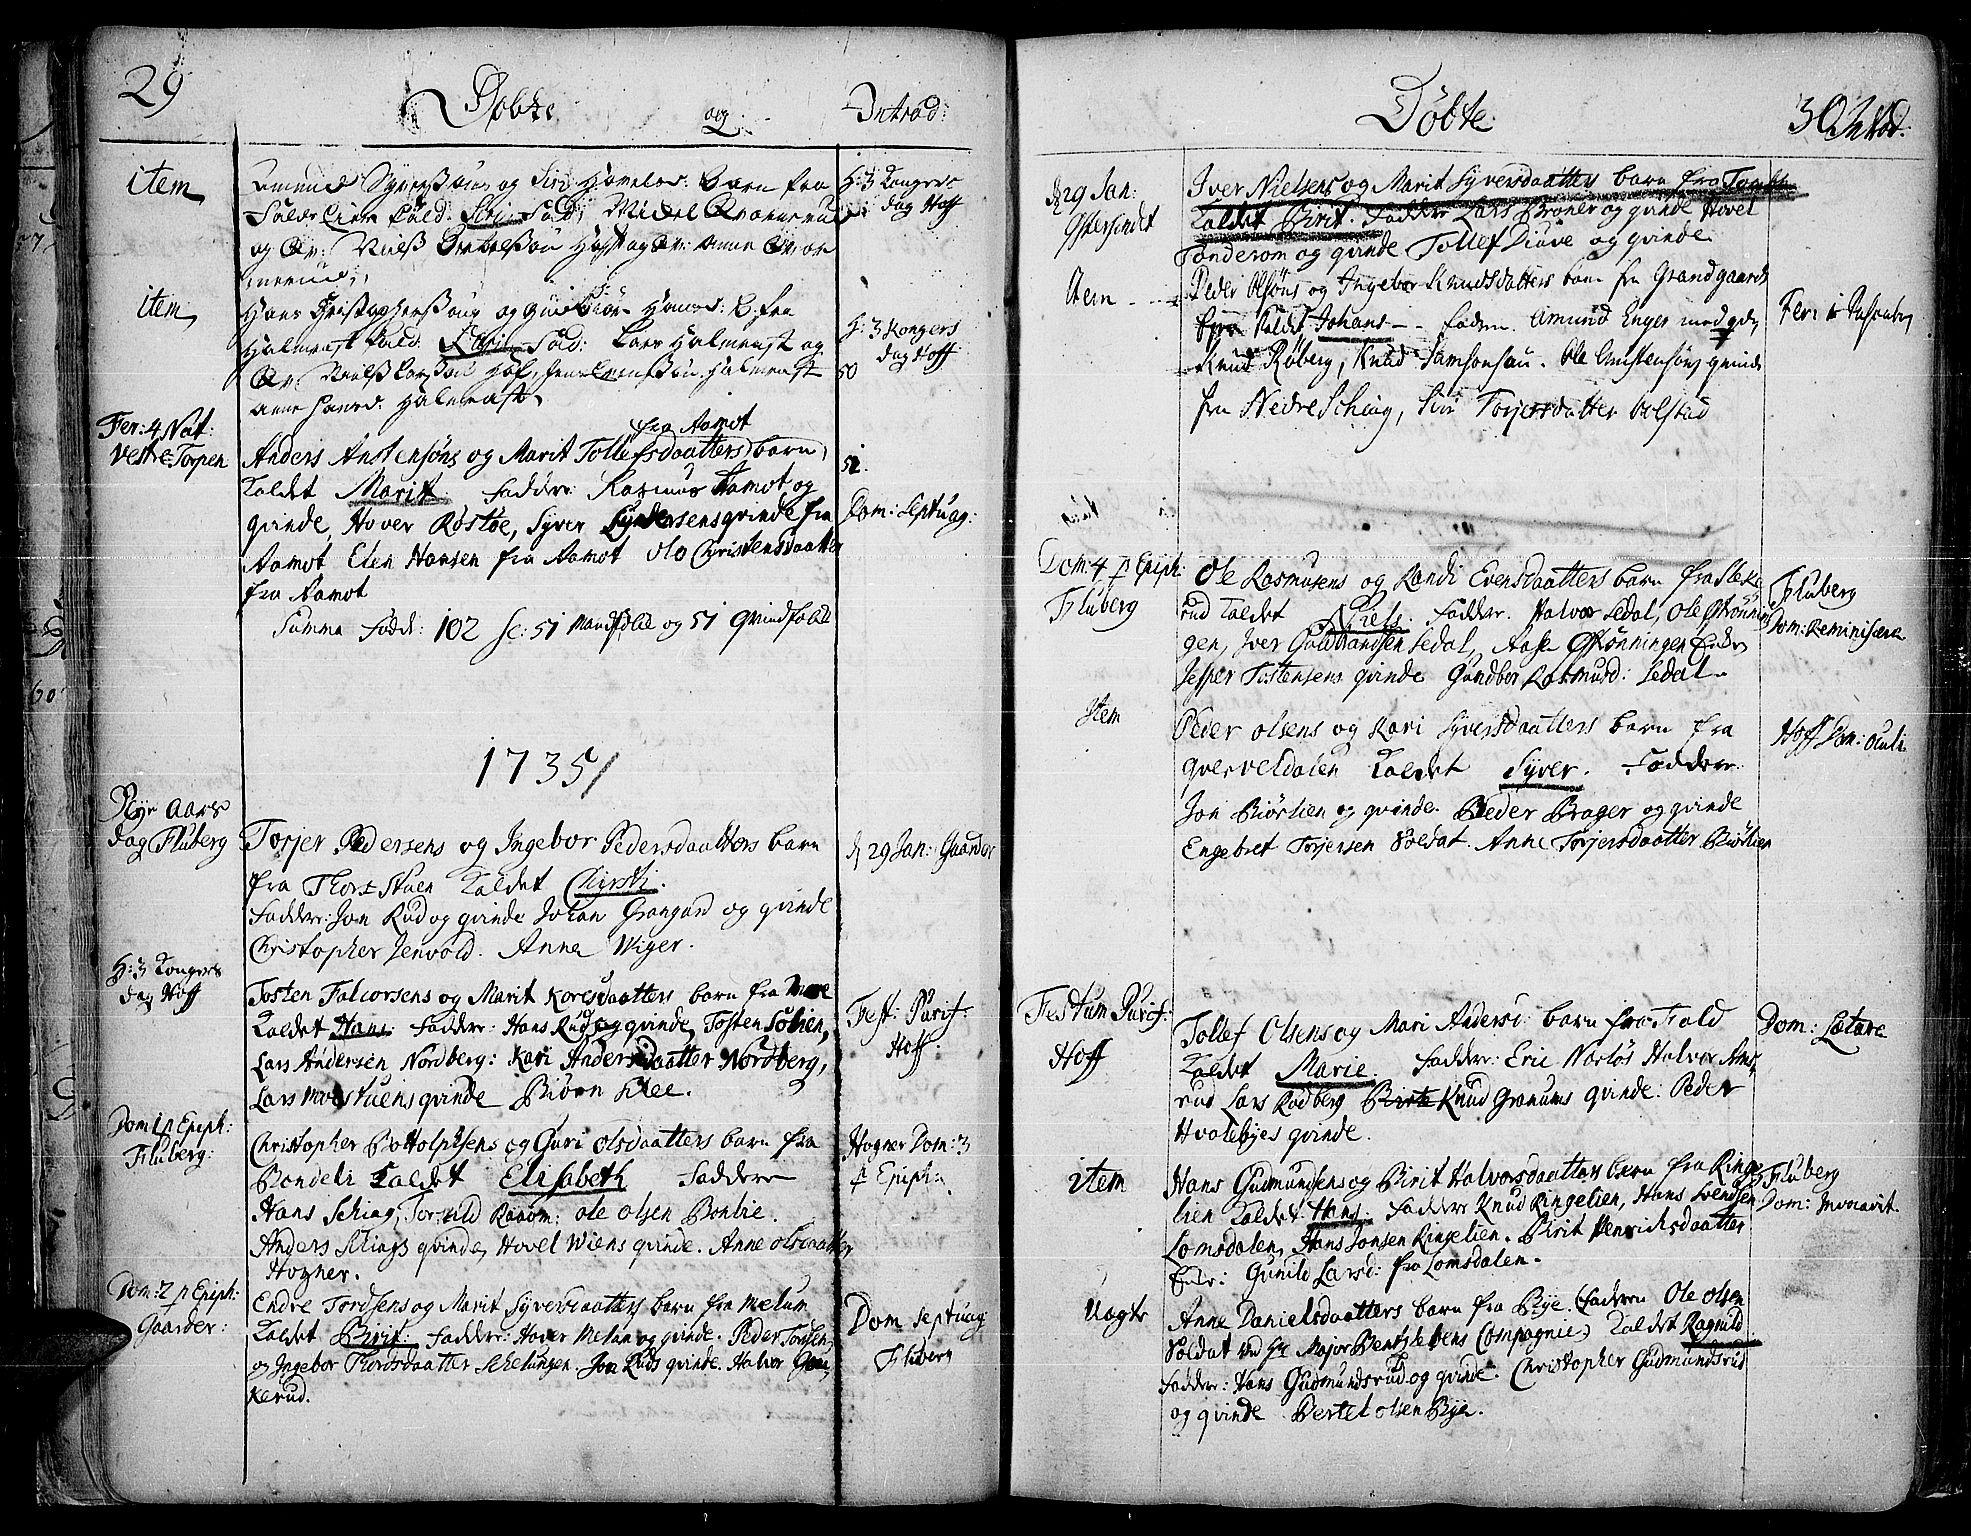 SAH, Land prestekontor, Ministerialbok nr. 2, 1733-1764, s. 29-30